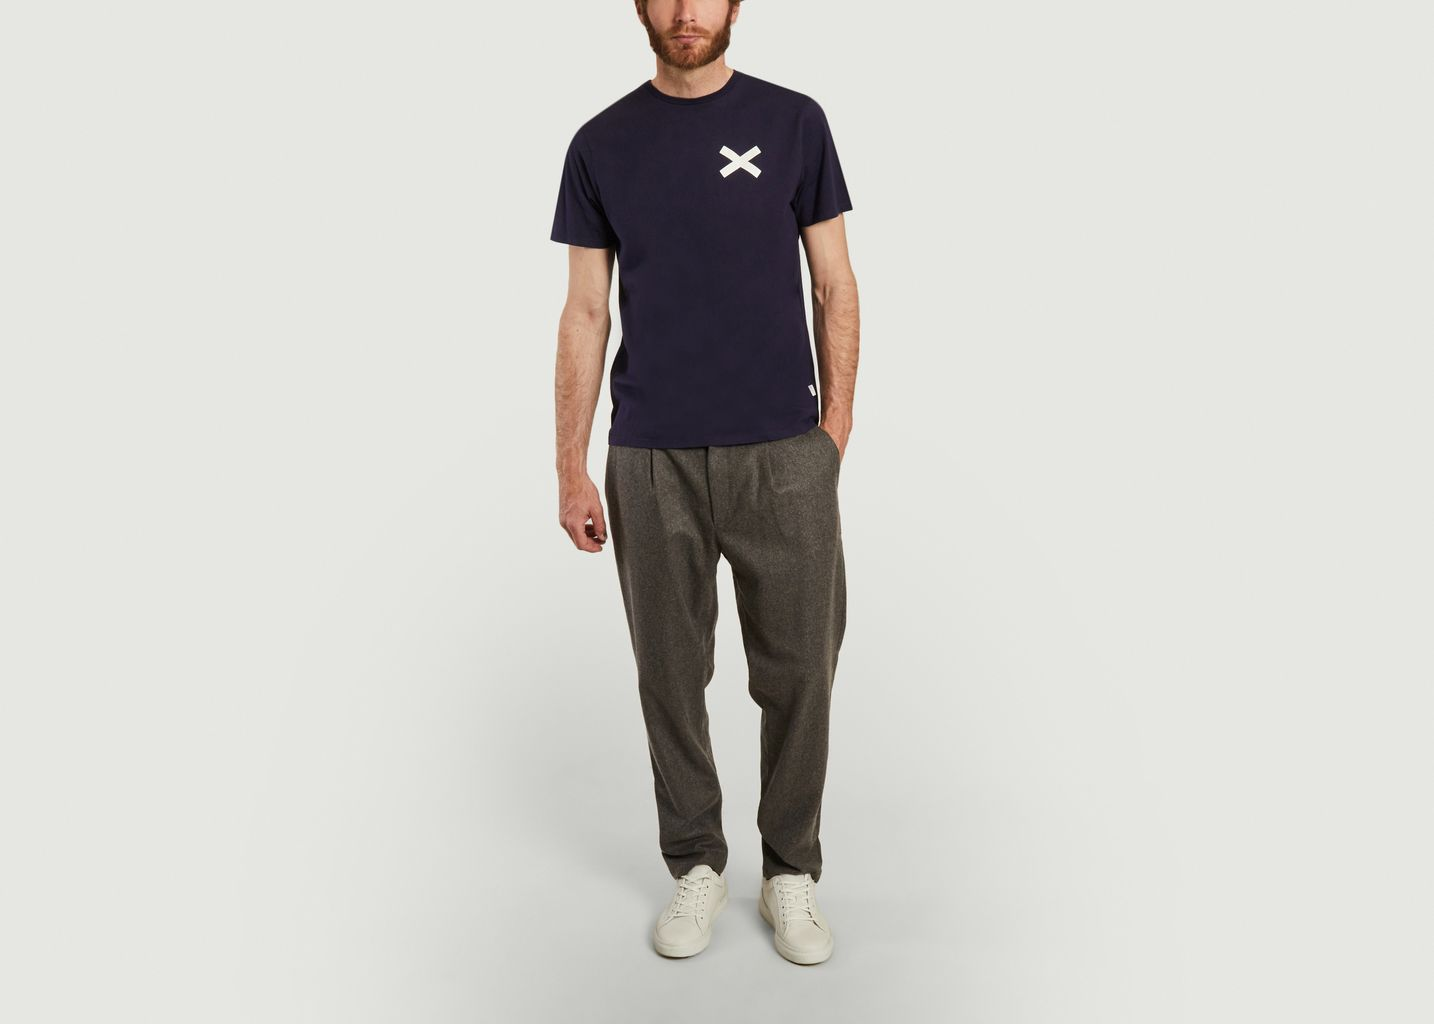 Pantalon droit en lainage Jack - Edmmond Studios